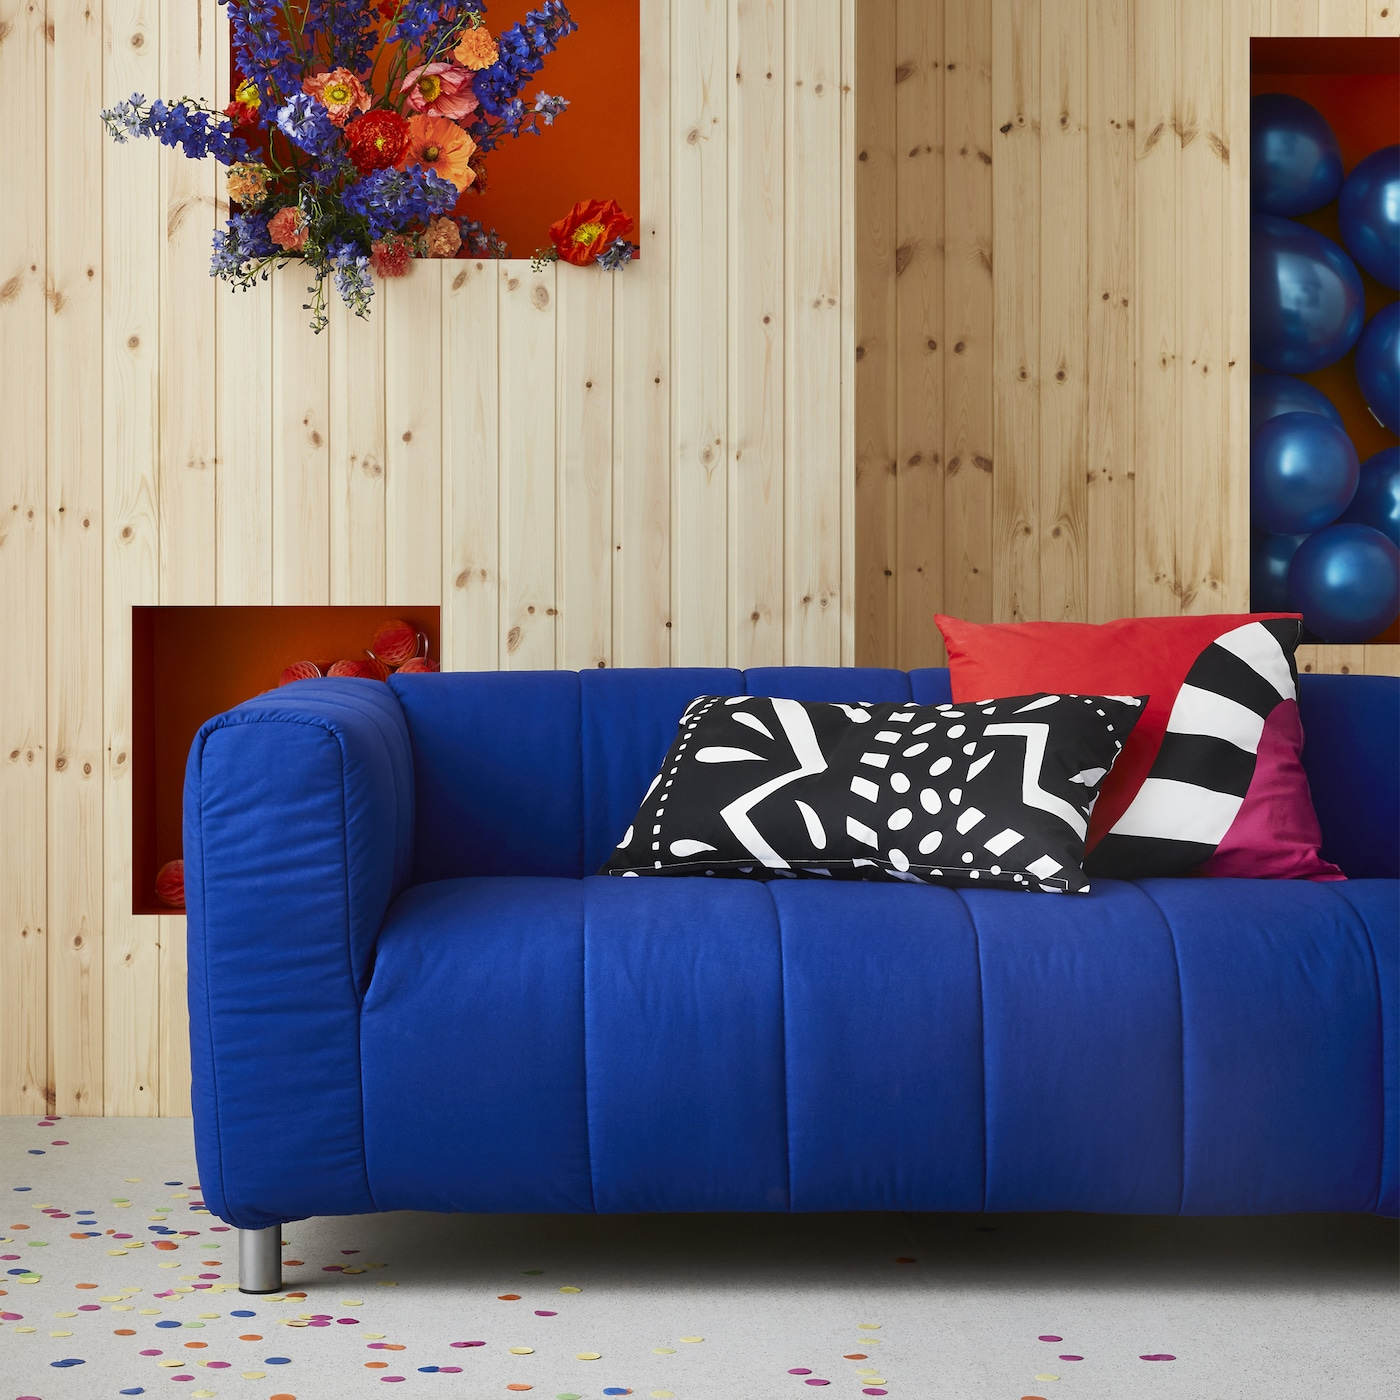 Ideen zur GRATULERA Jubiläumskollektion IKEA